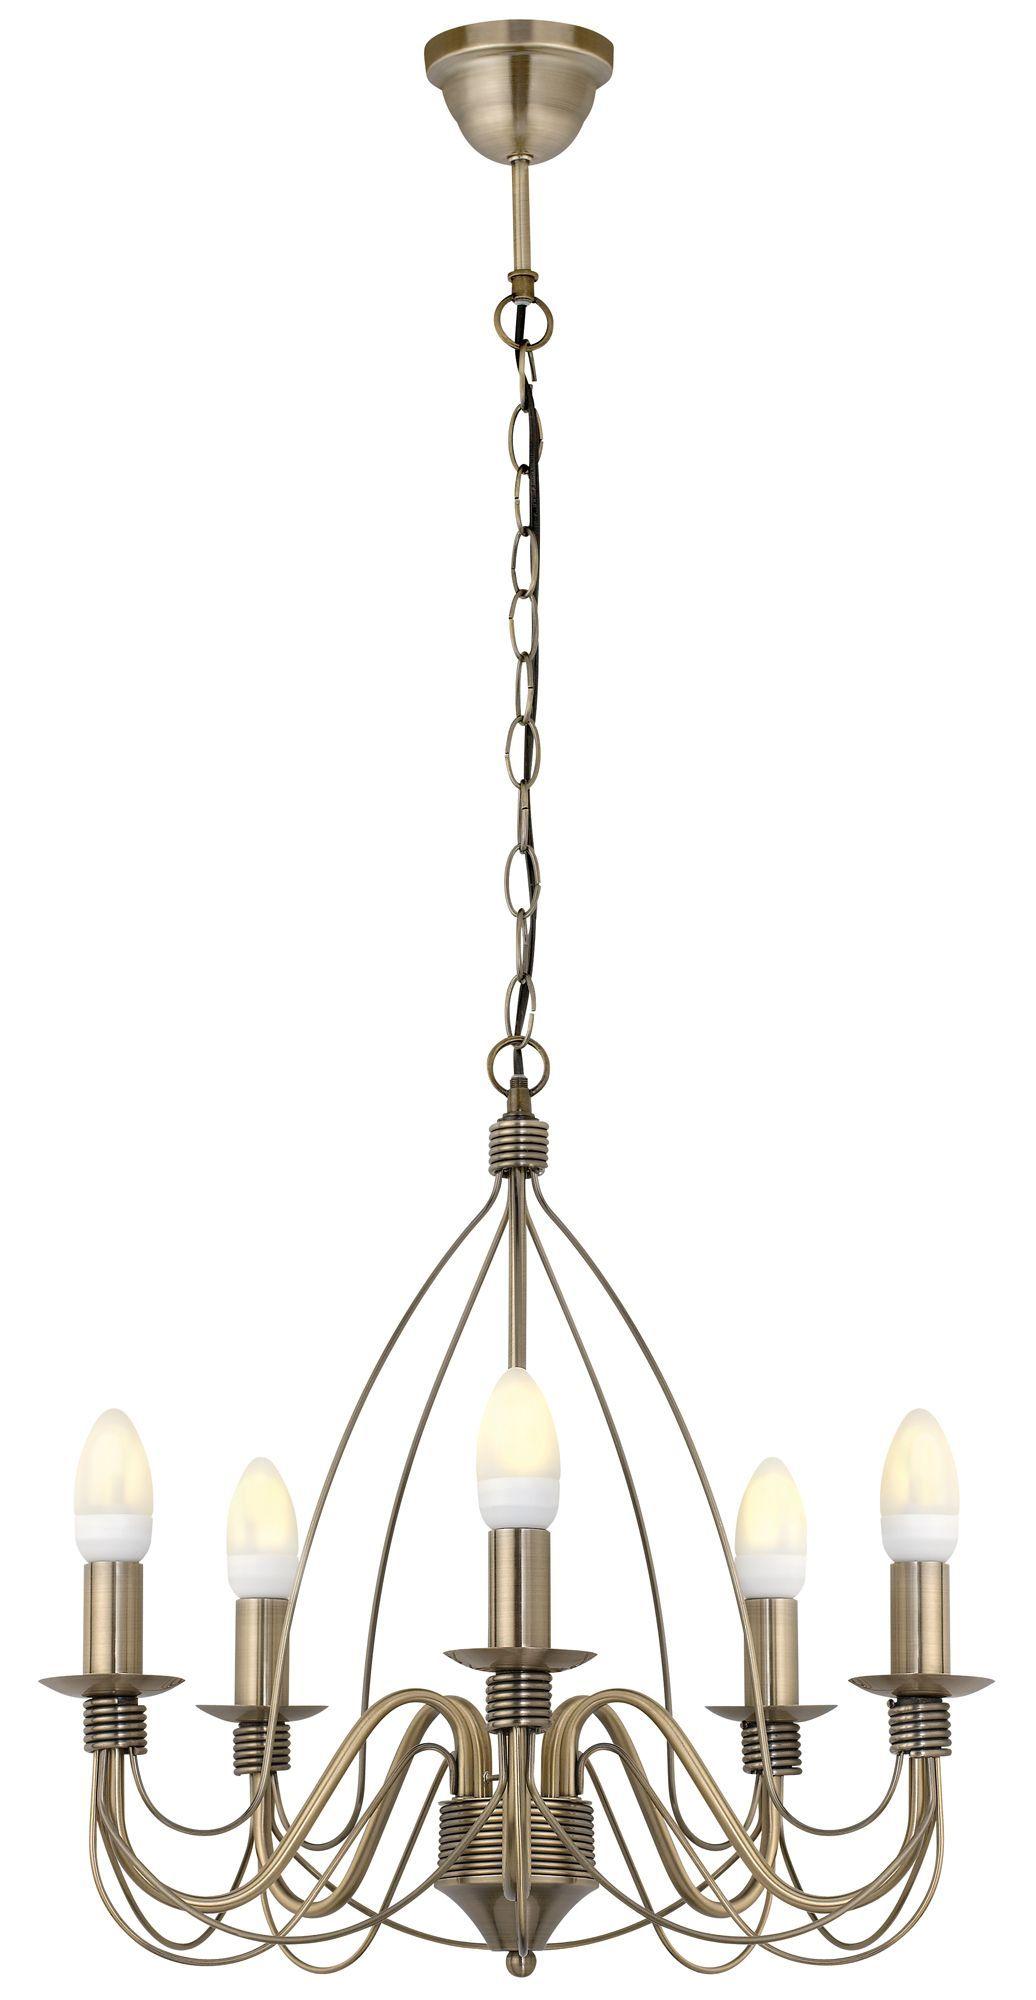 Vas Birdcage 5 Lamp Pendant Ceiling Light | Ceiling, Living room ...